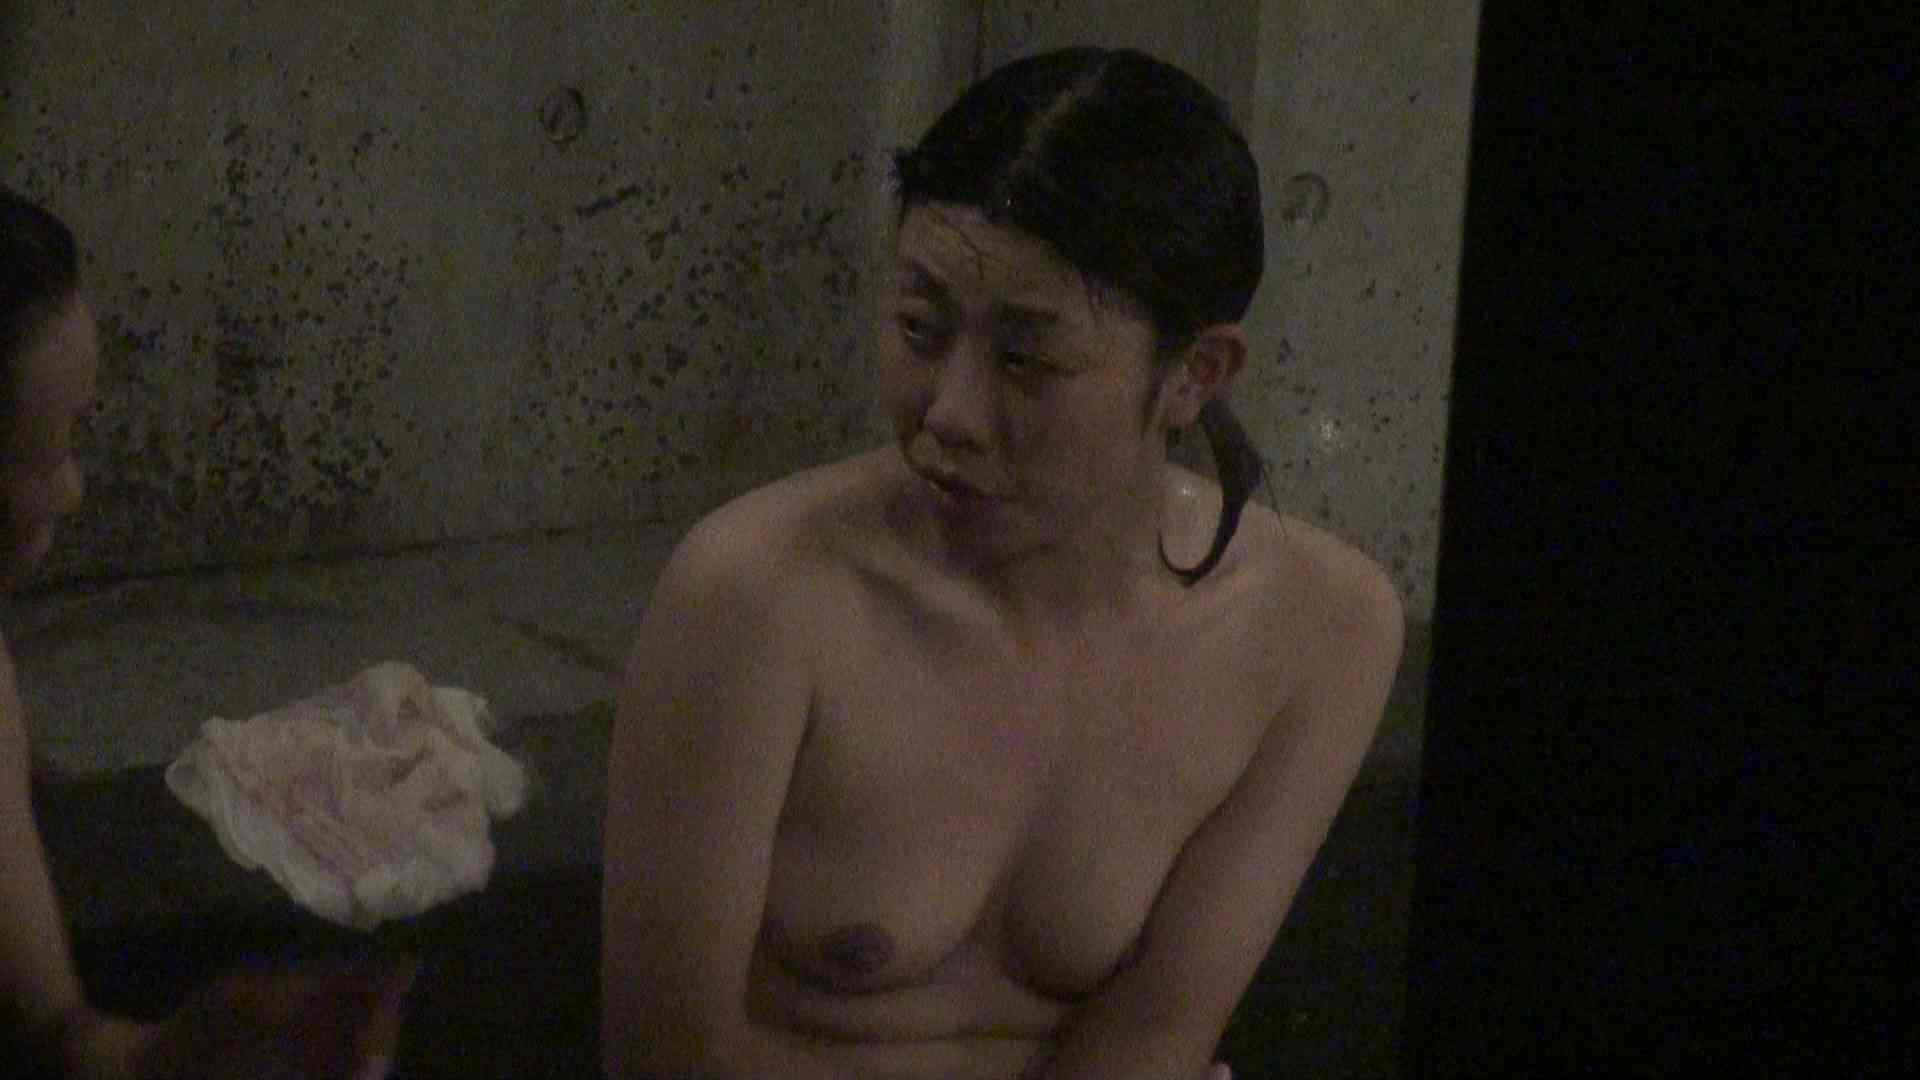 Aquaな露天風呂Vol.330 盗撮   HなOL  83pic 12